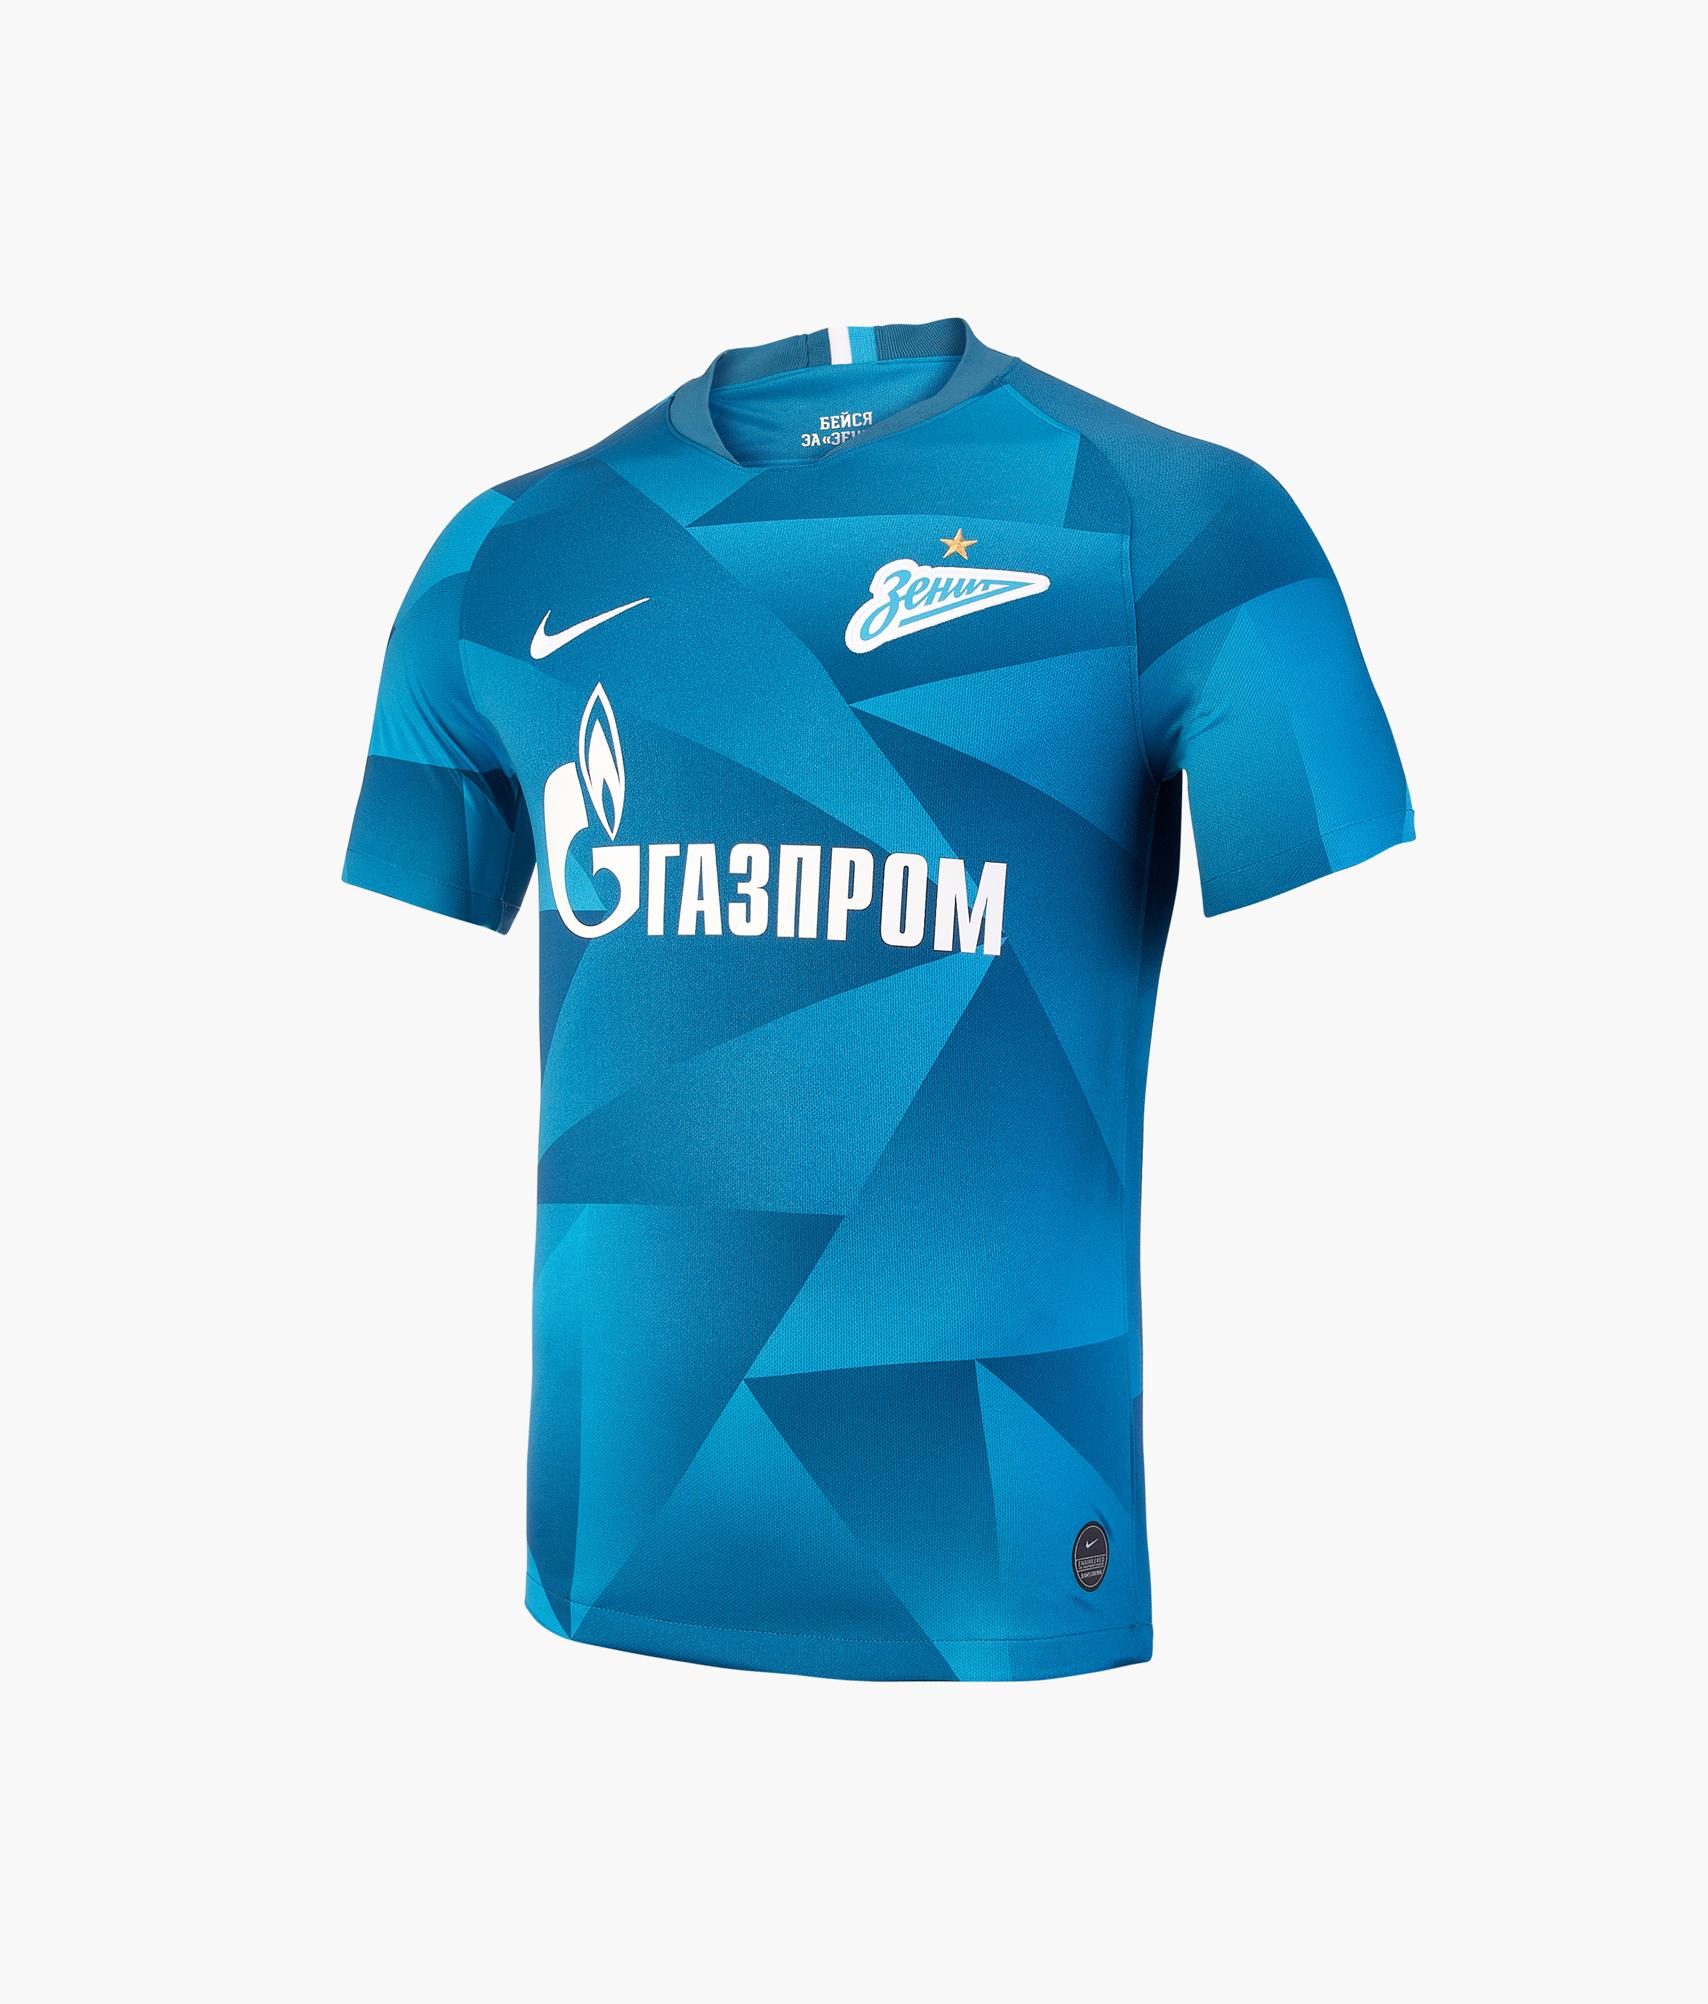 Домашняя игровая футболка Nike сезон 2019/20 Nike Цвет-Синий оригинальная домашняя футболка nike фк зенит 2019 20